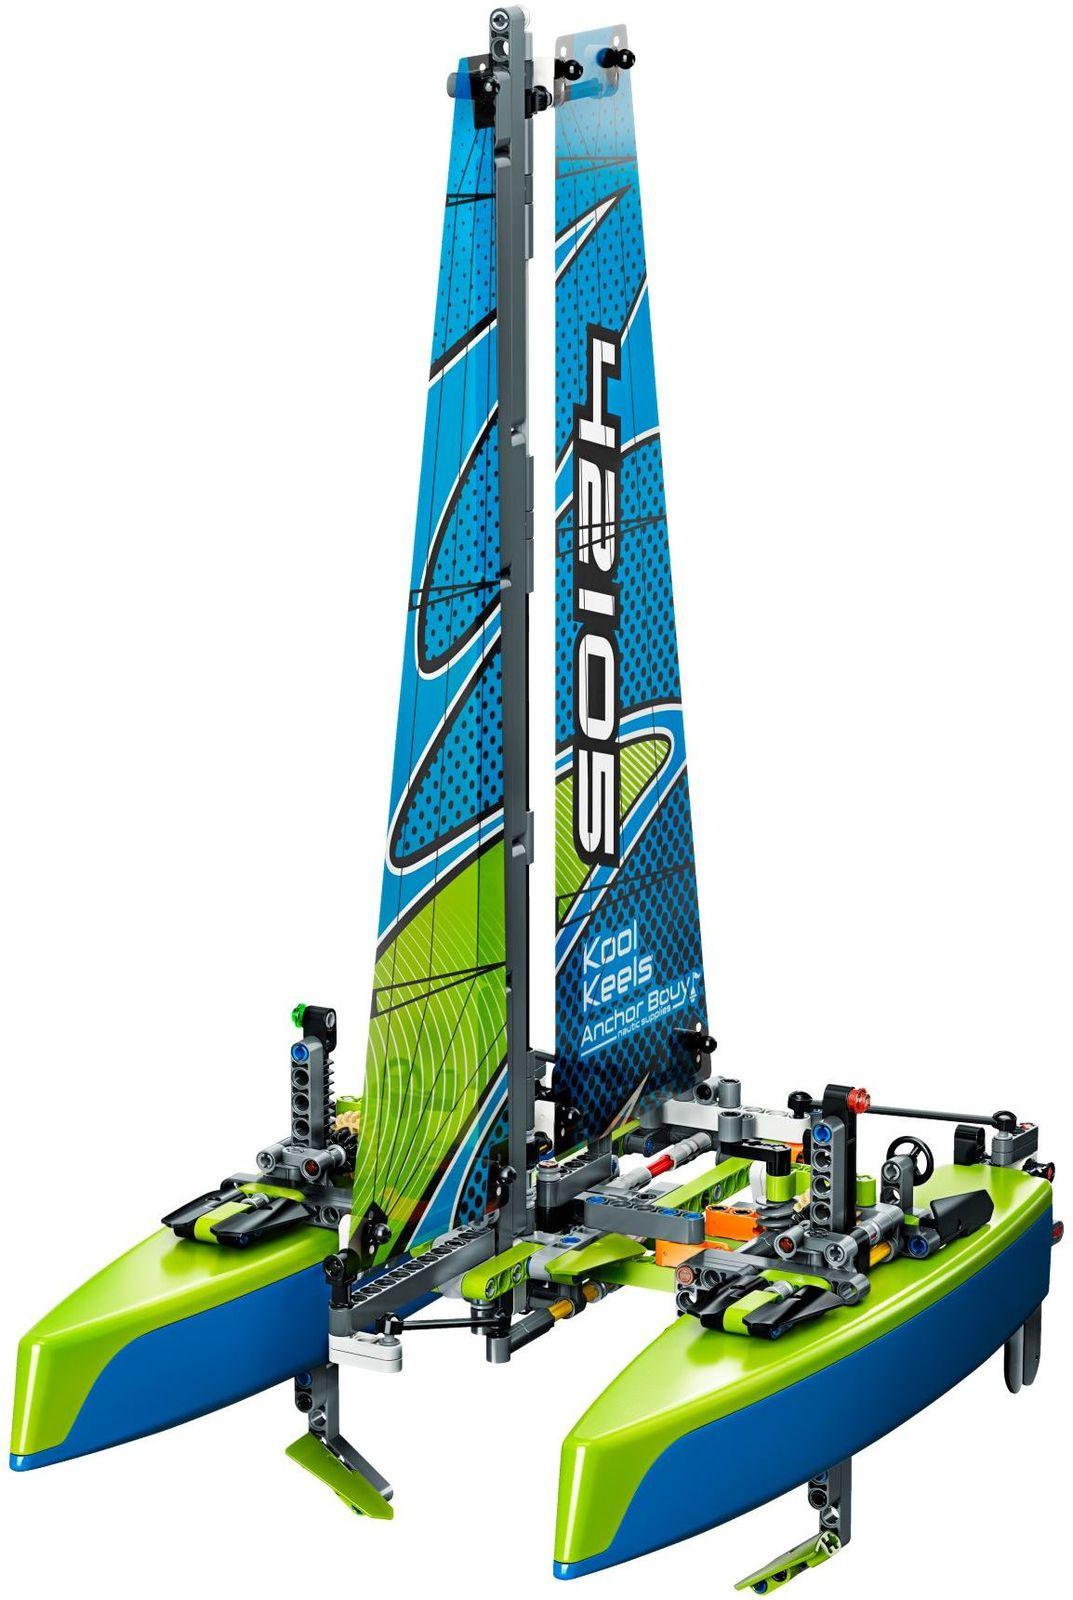 LEGO Technic: Catamaran - (42105) image